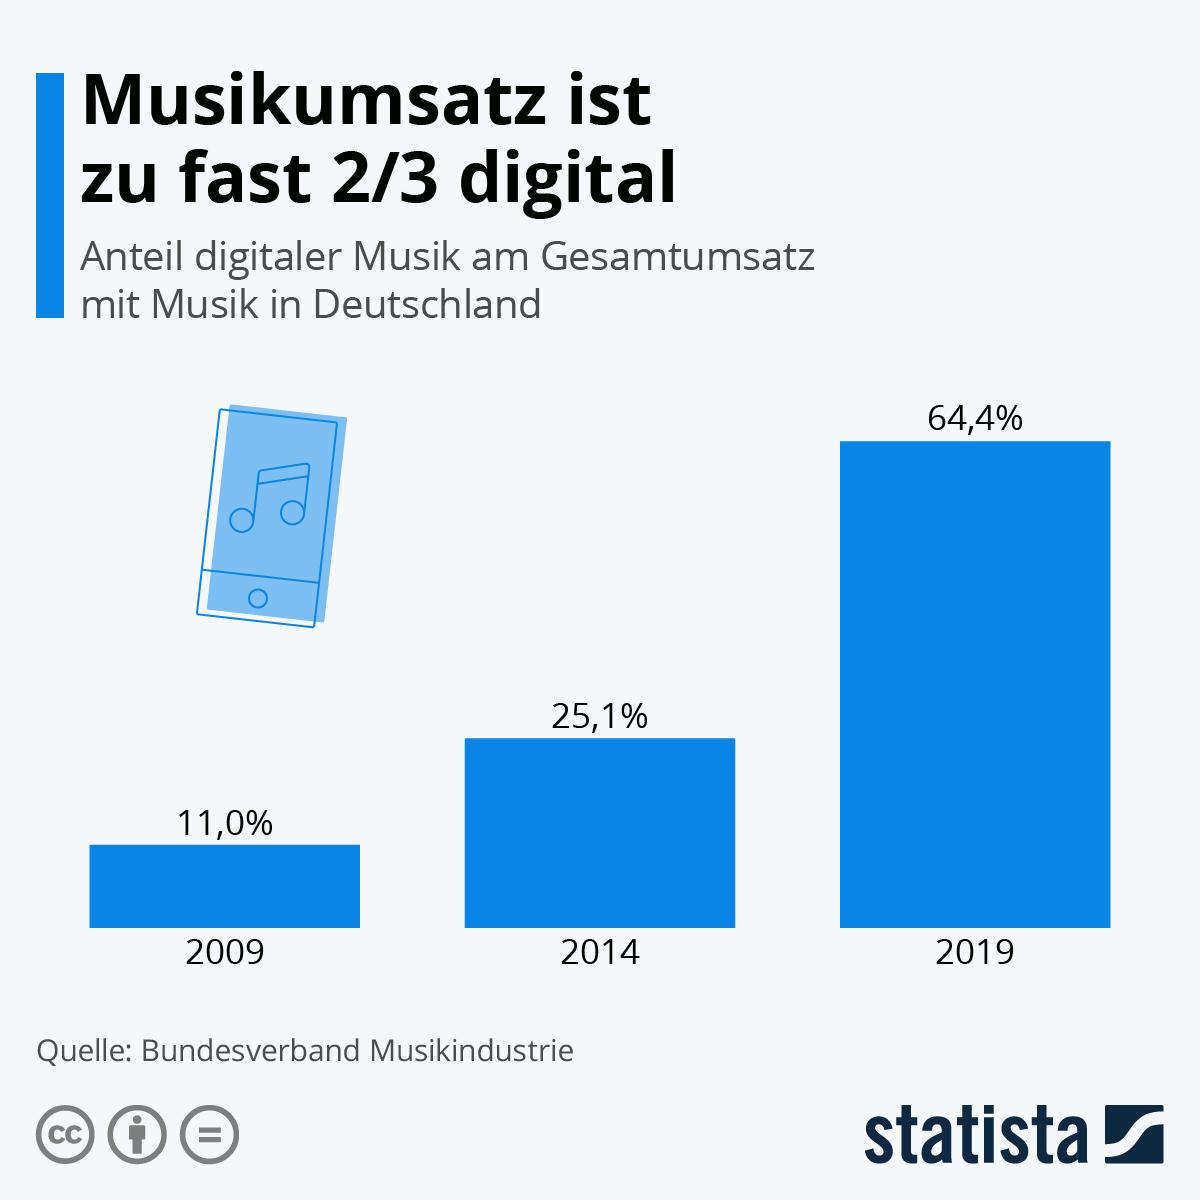 Infografik: Umsatzanteil digitaler Musik klettert auf 38% | Statista